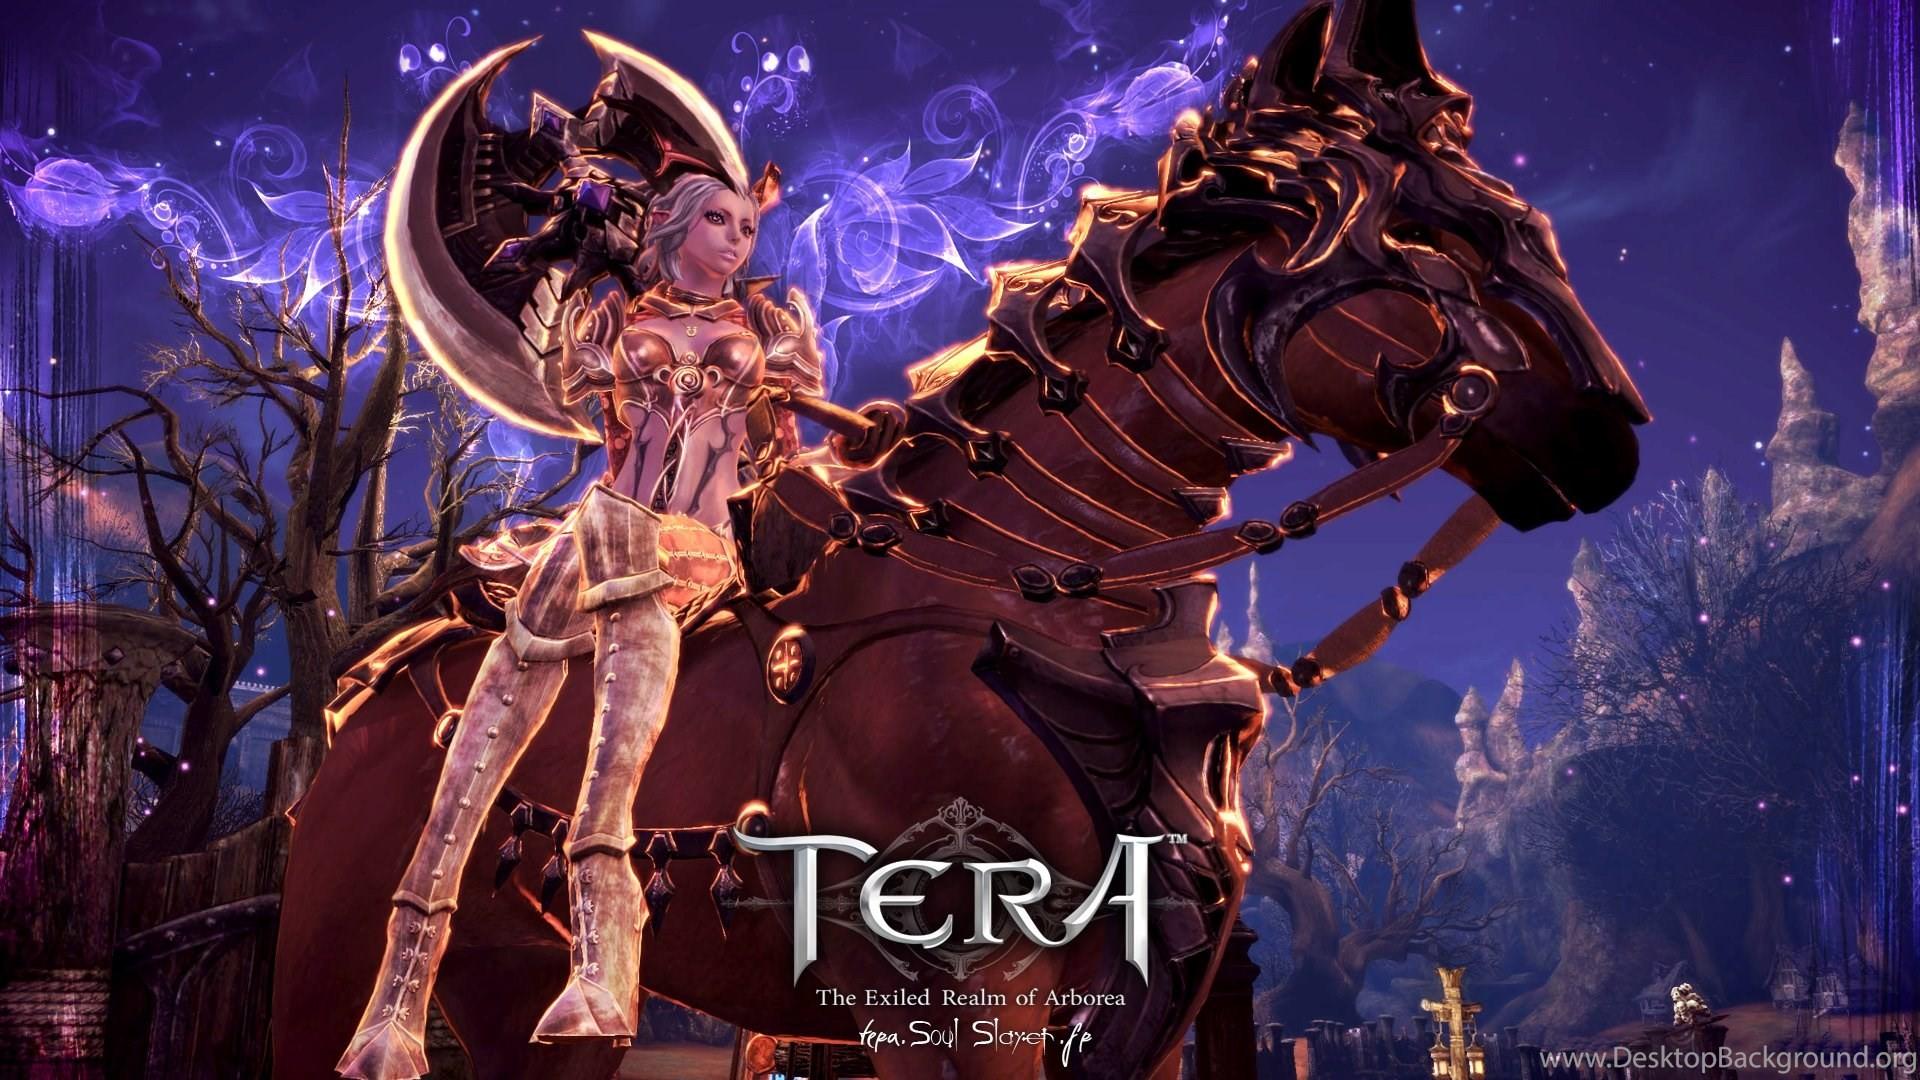 Tera Online Wallpaper 1080p